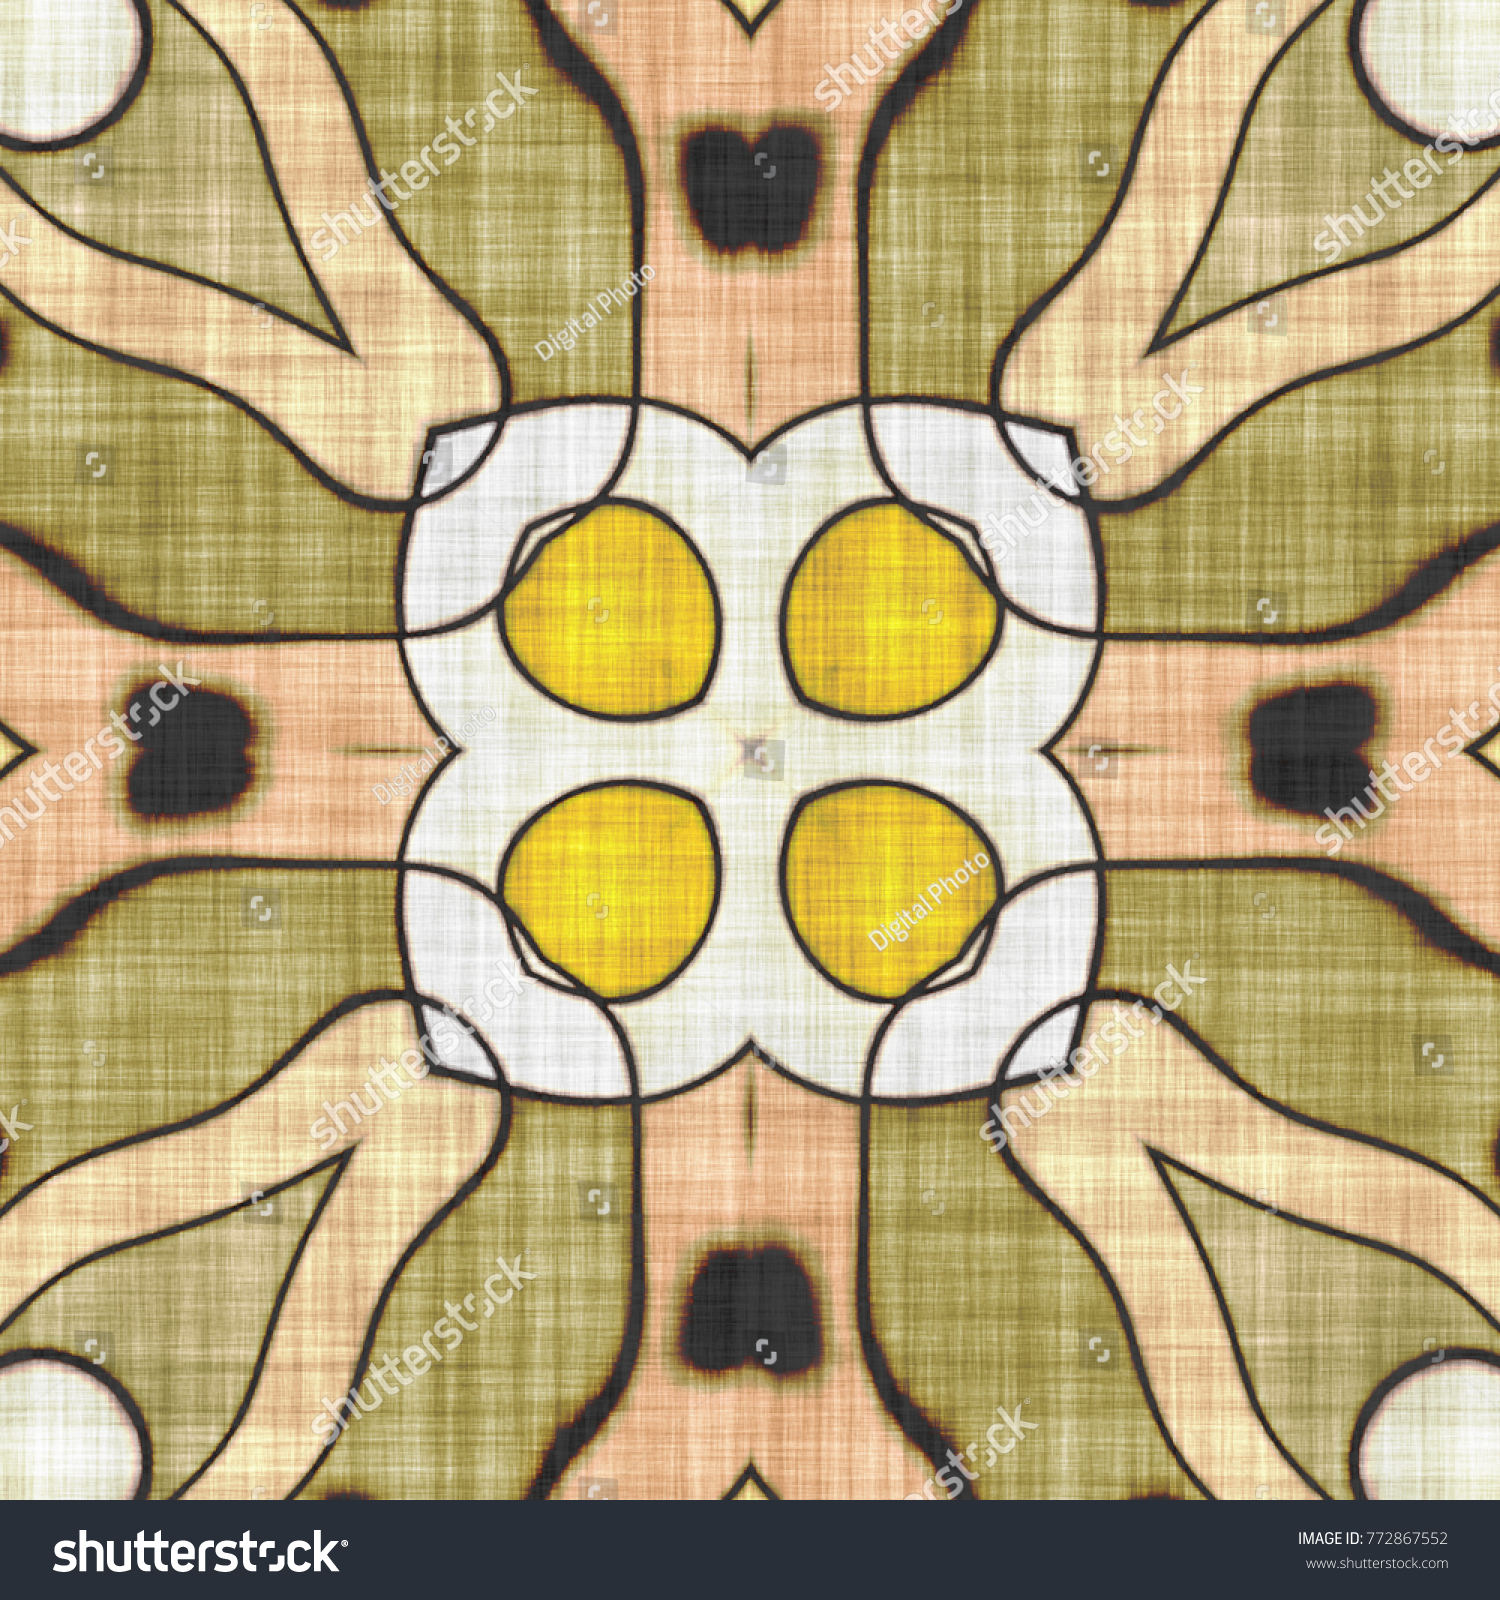 Charming Mandala Wall Decor Ideas - The Wall Art Decorations ...